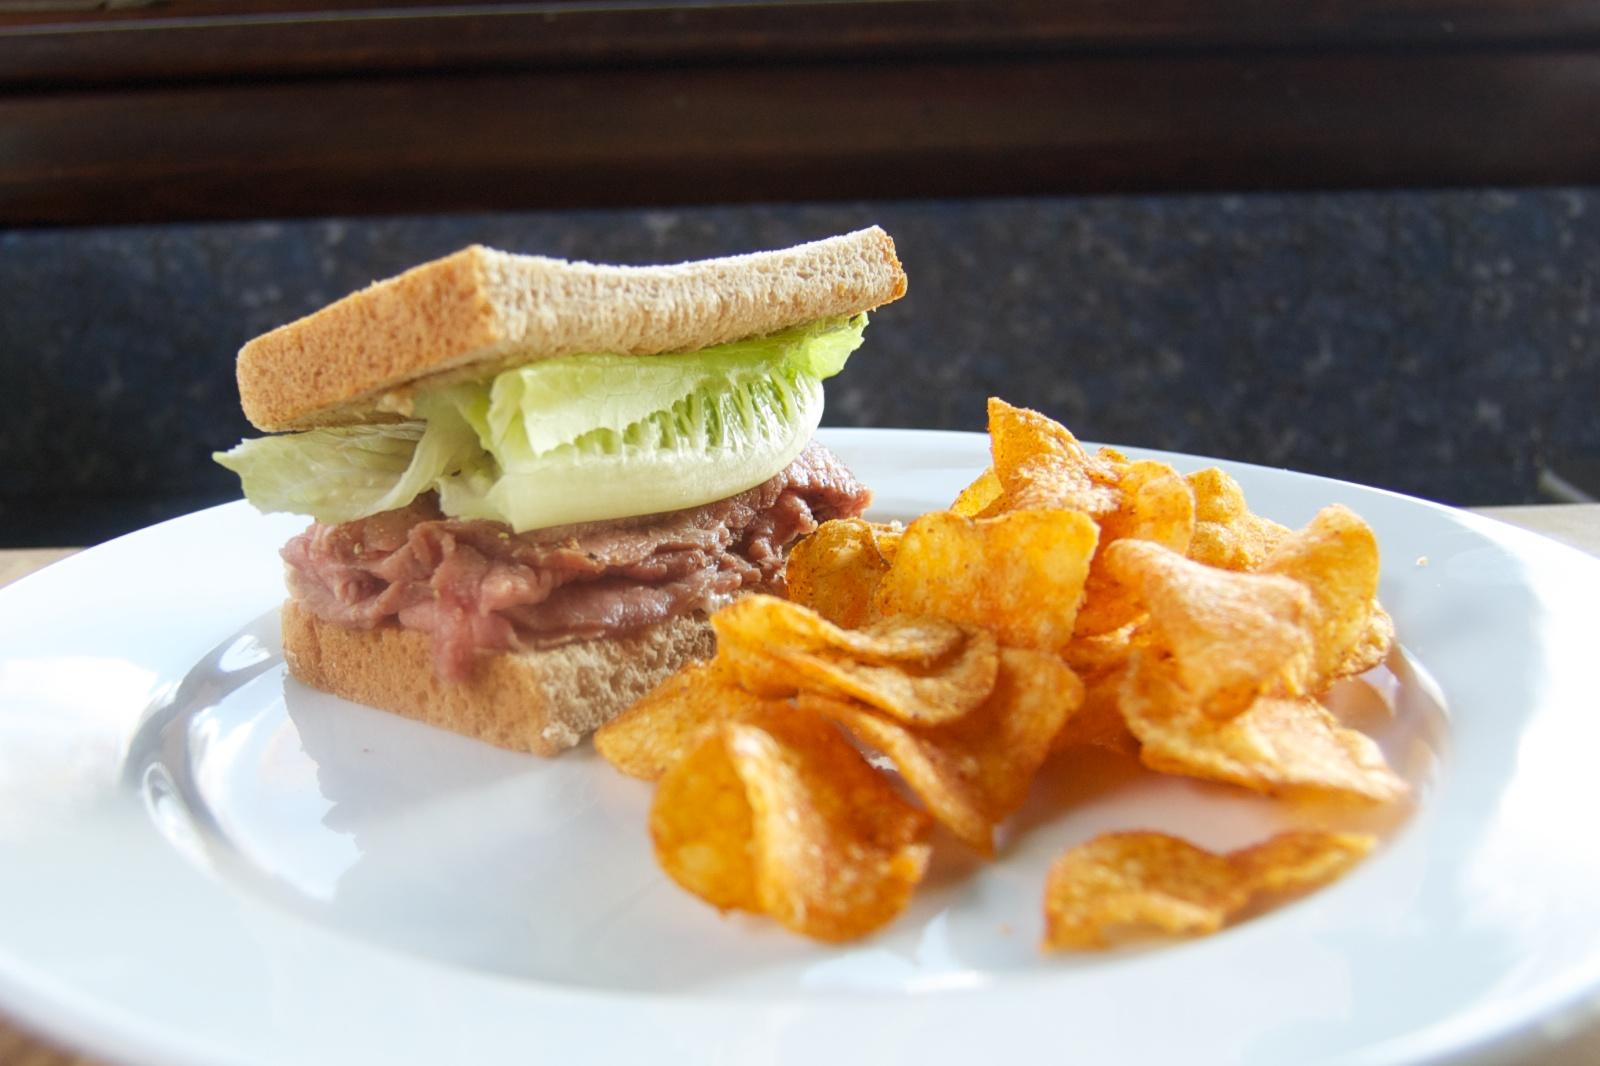 http://blog.rickk.com/food/2011/10/25/ate.2011.10.25.l.jpg